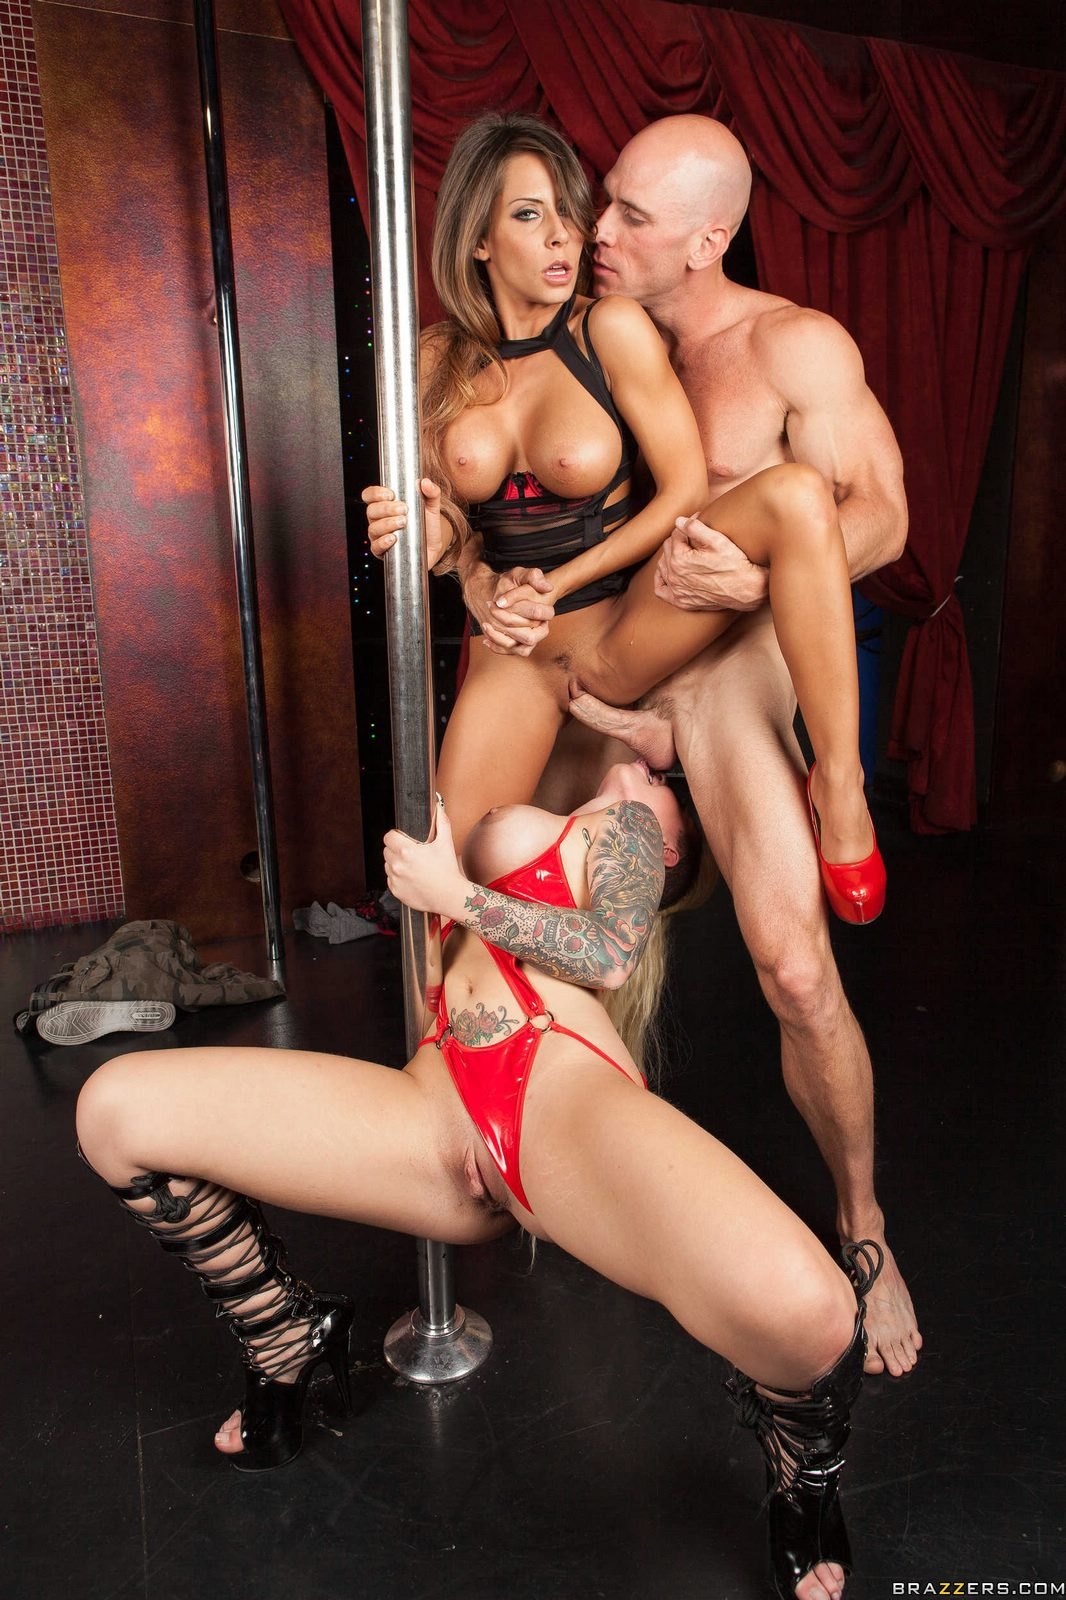 madison ivy stripper